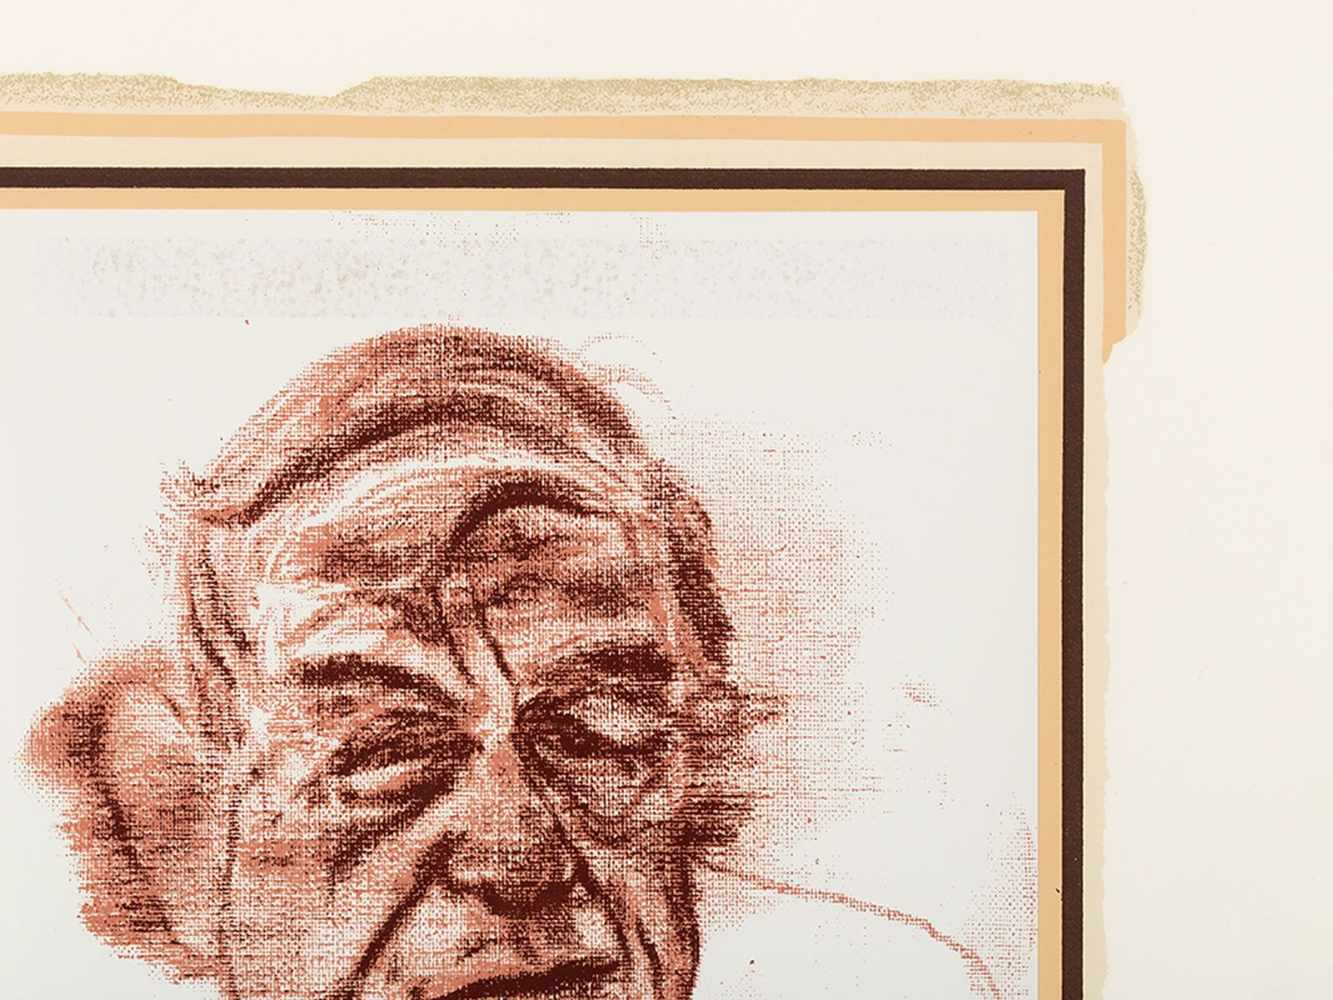 R.B. Kitaj (1887-1948), W.H. Auden, Color Serigraph, 1969 - Image 7 of 10